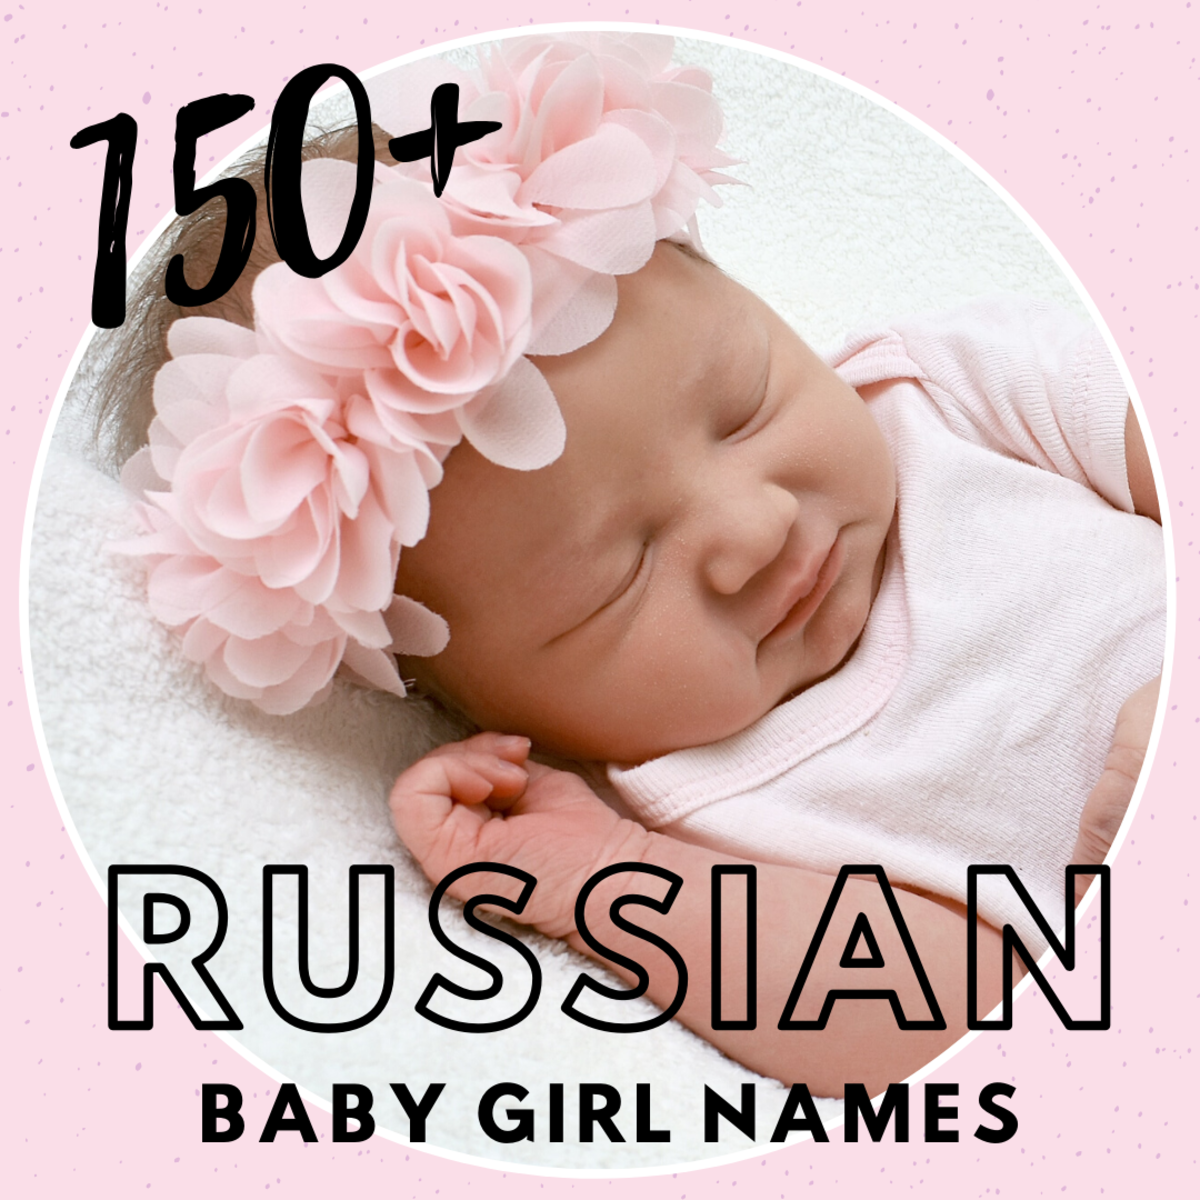 150+ Russian Baby Girl Names